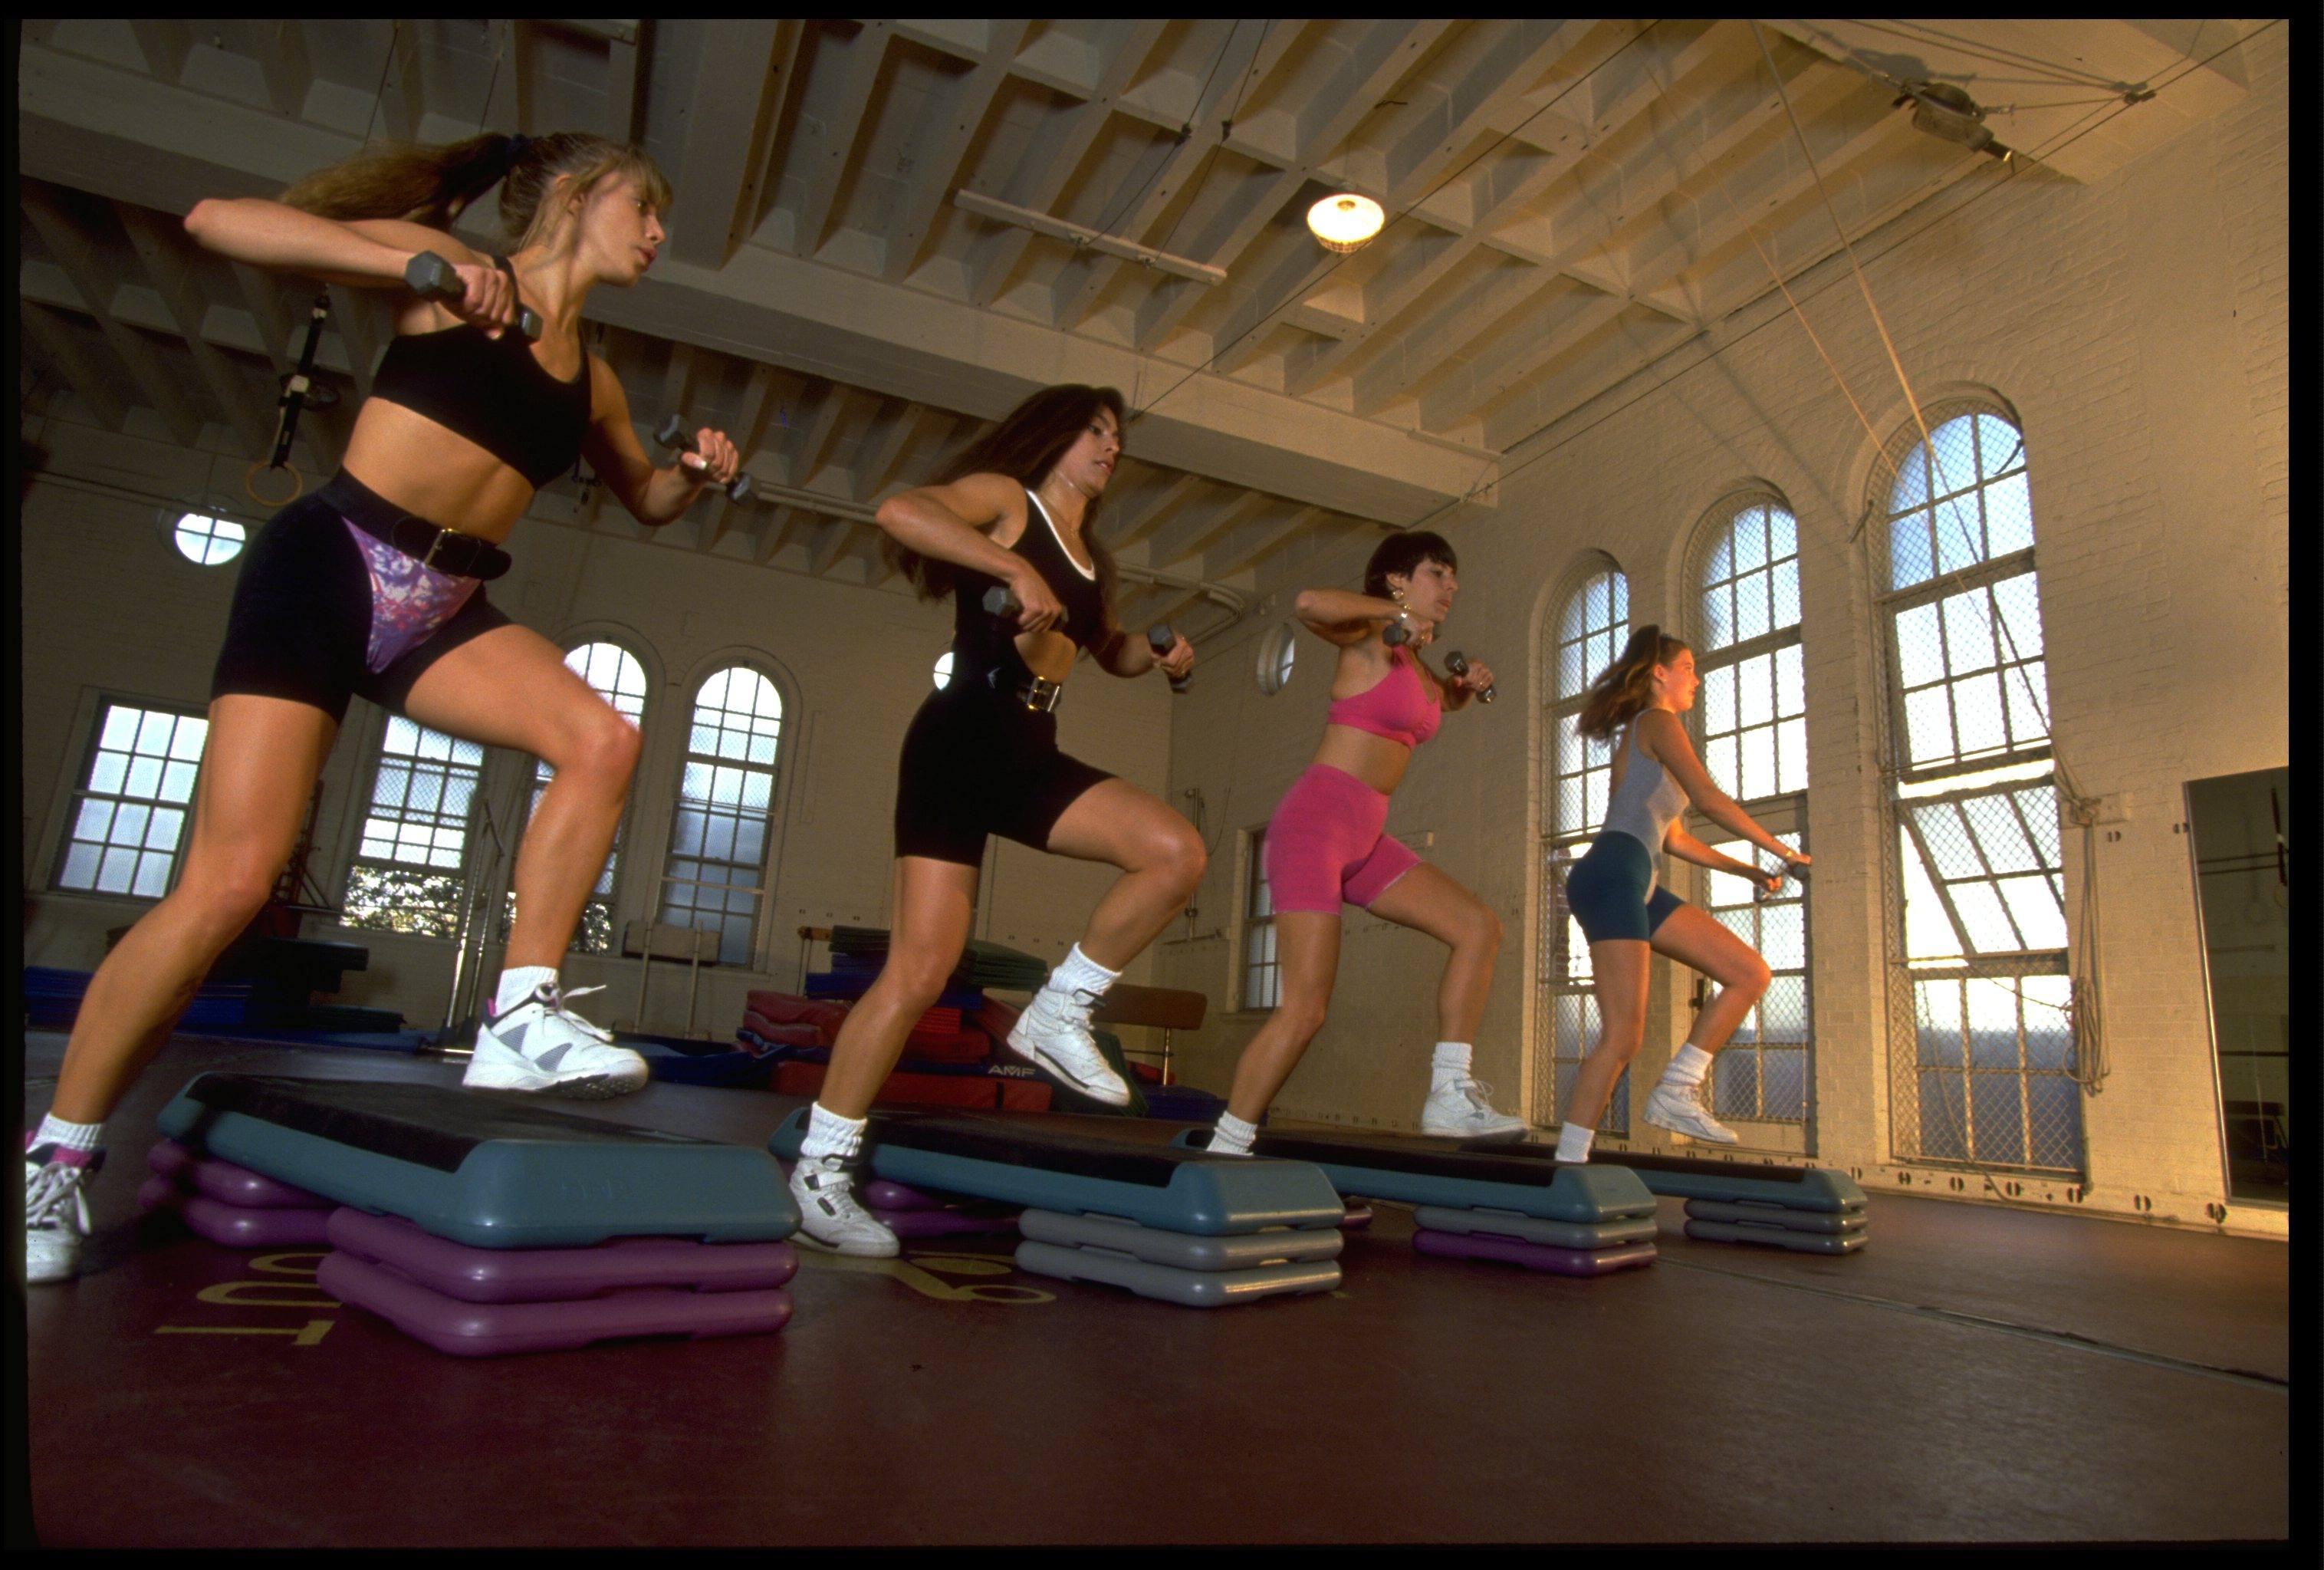 Women participate in an aerobics workout